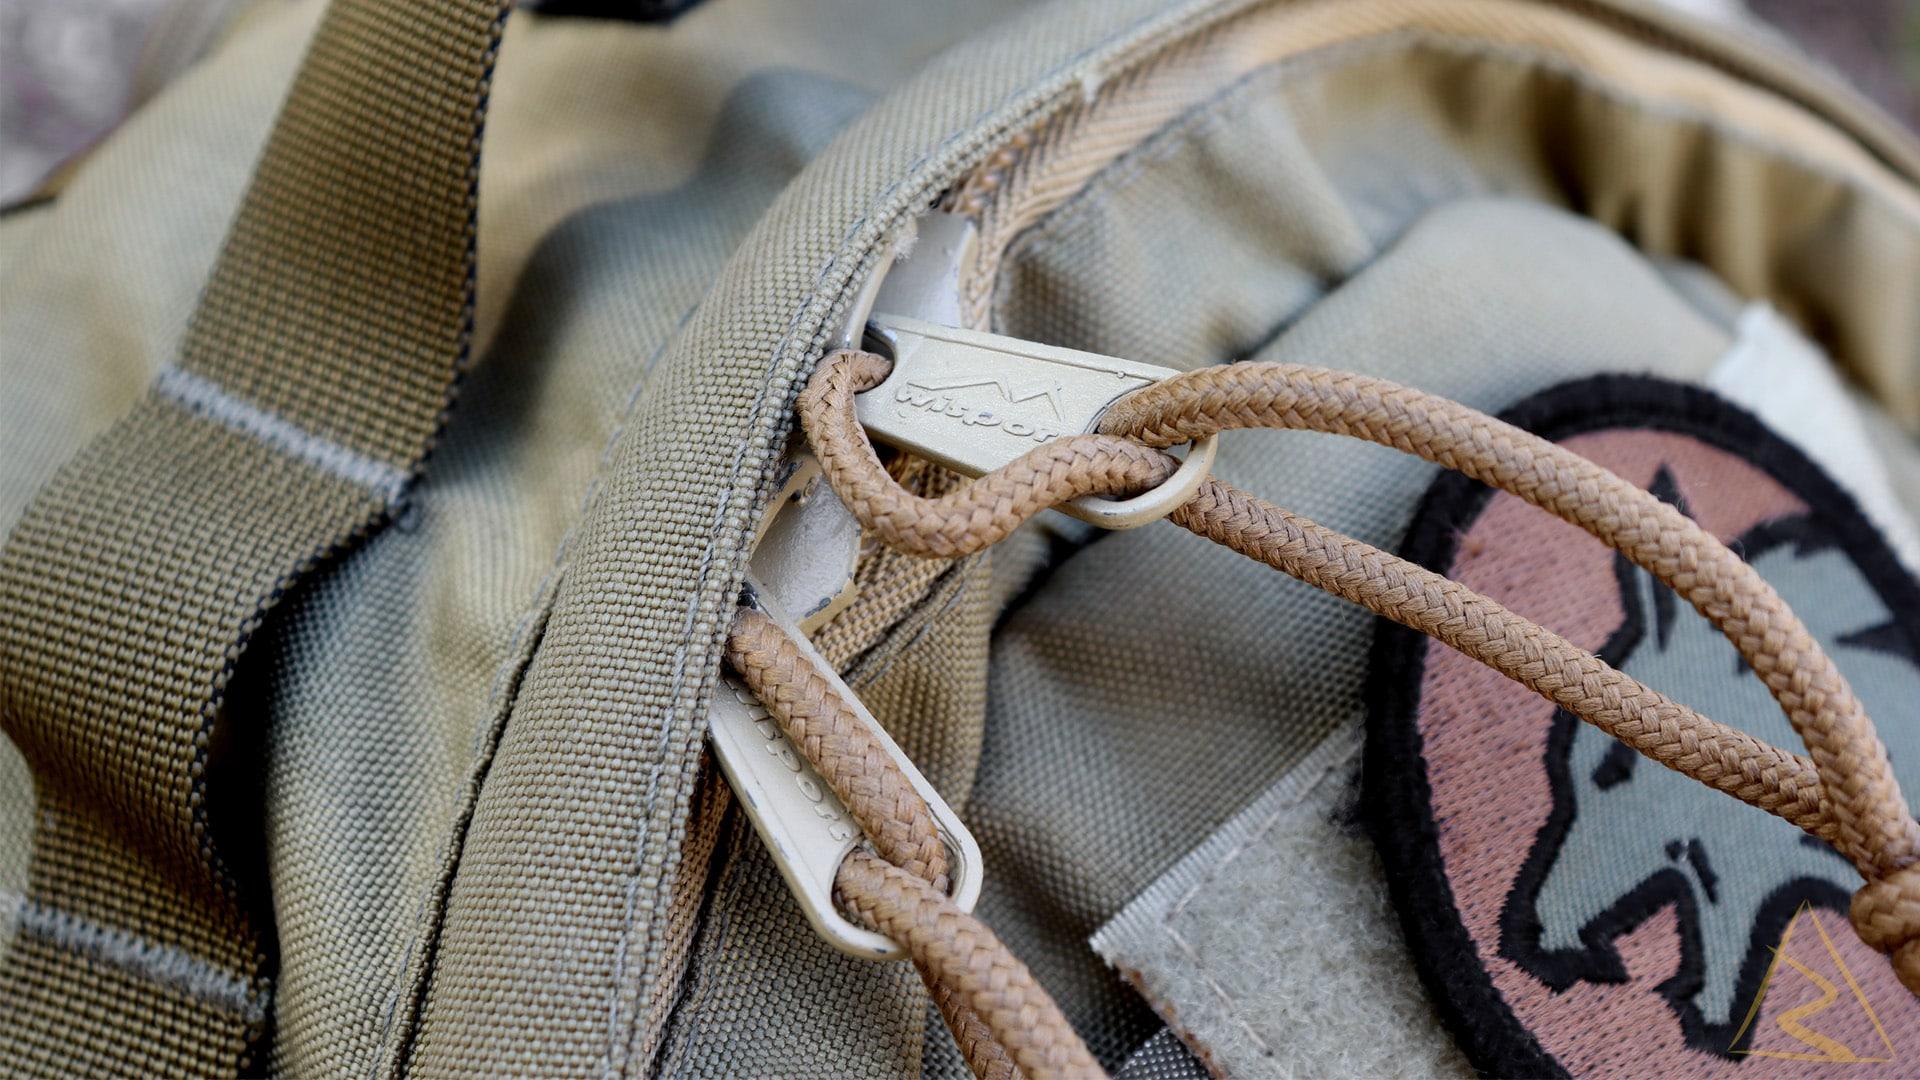 Wisport Sparrow Egg Backpack Zippers